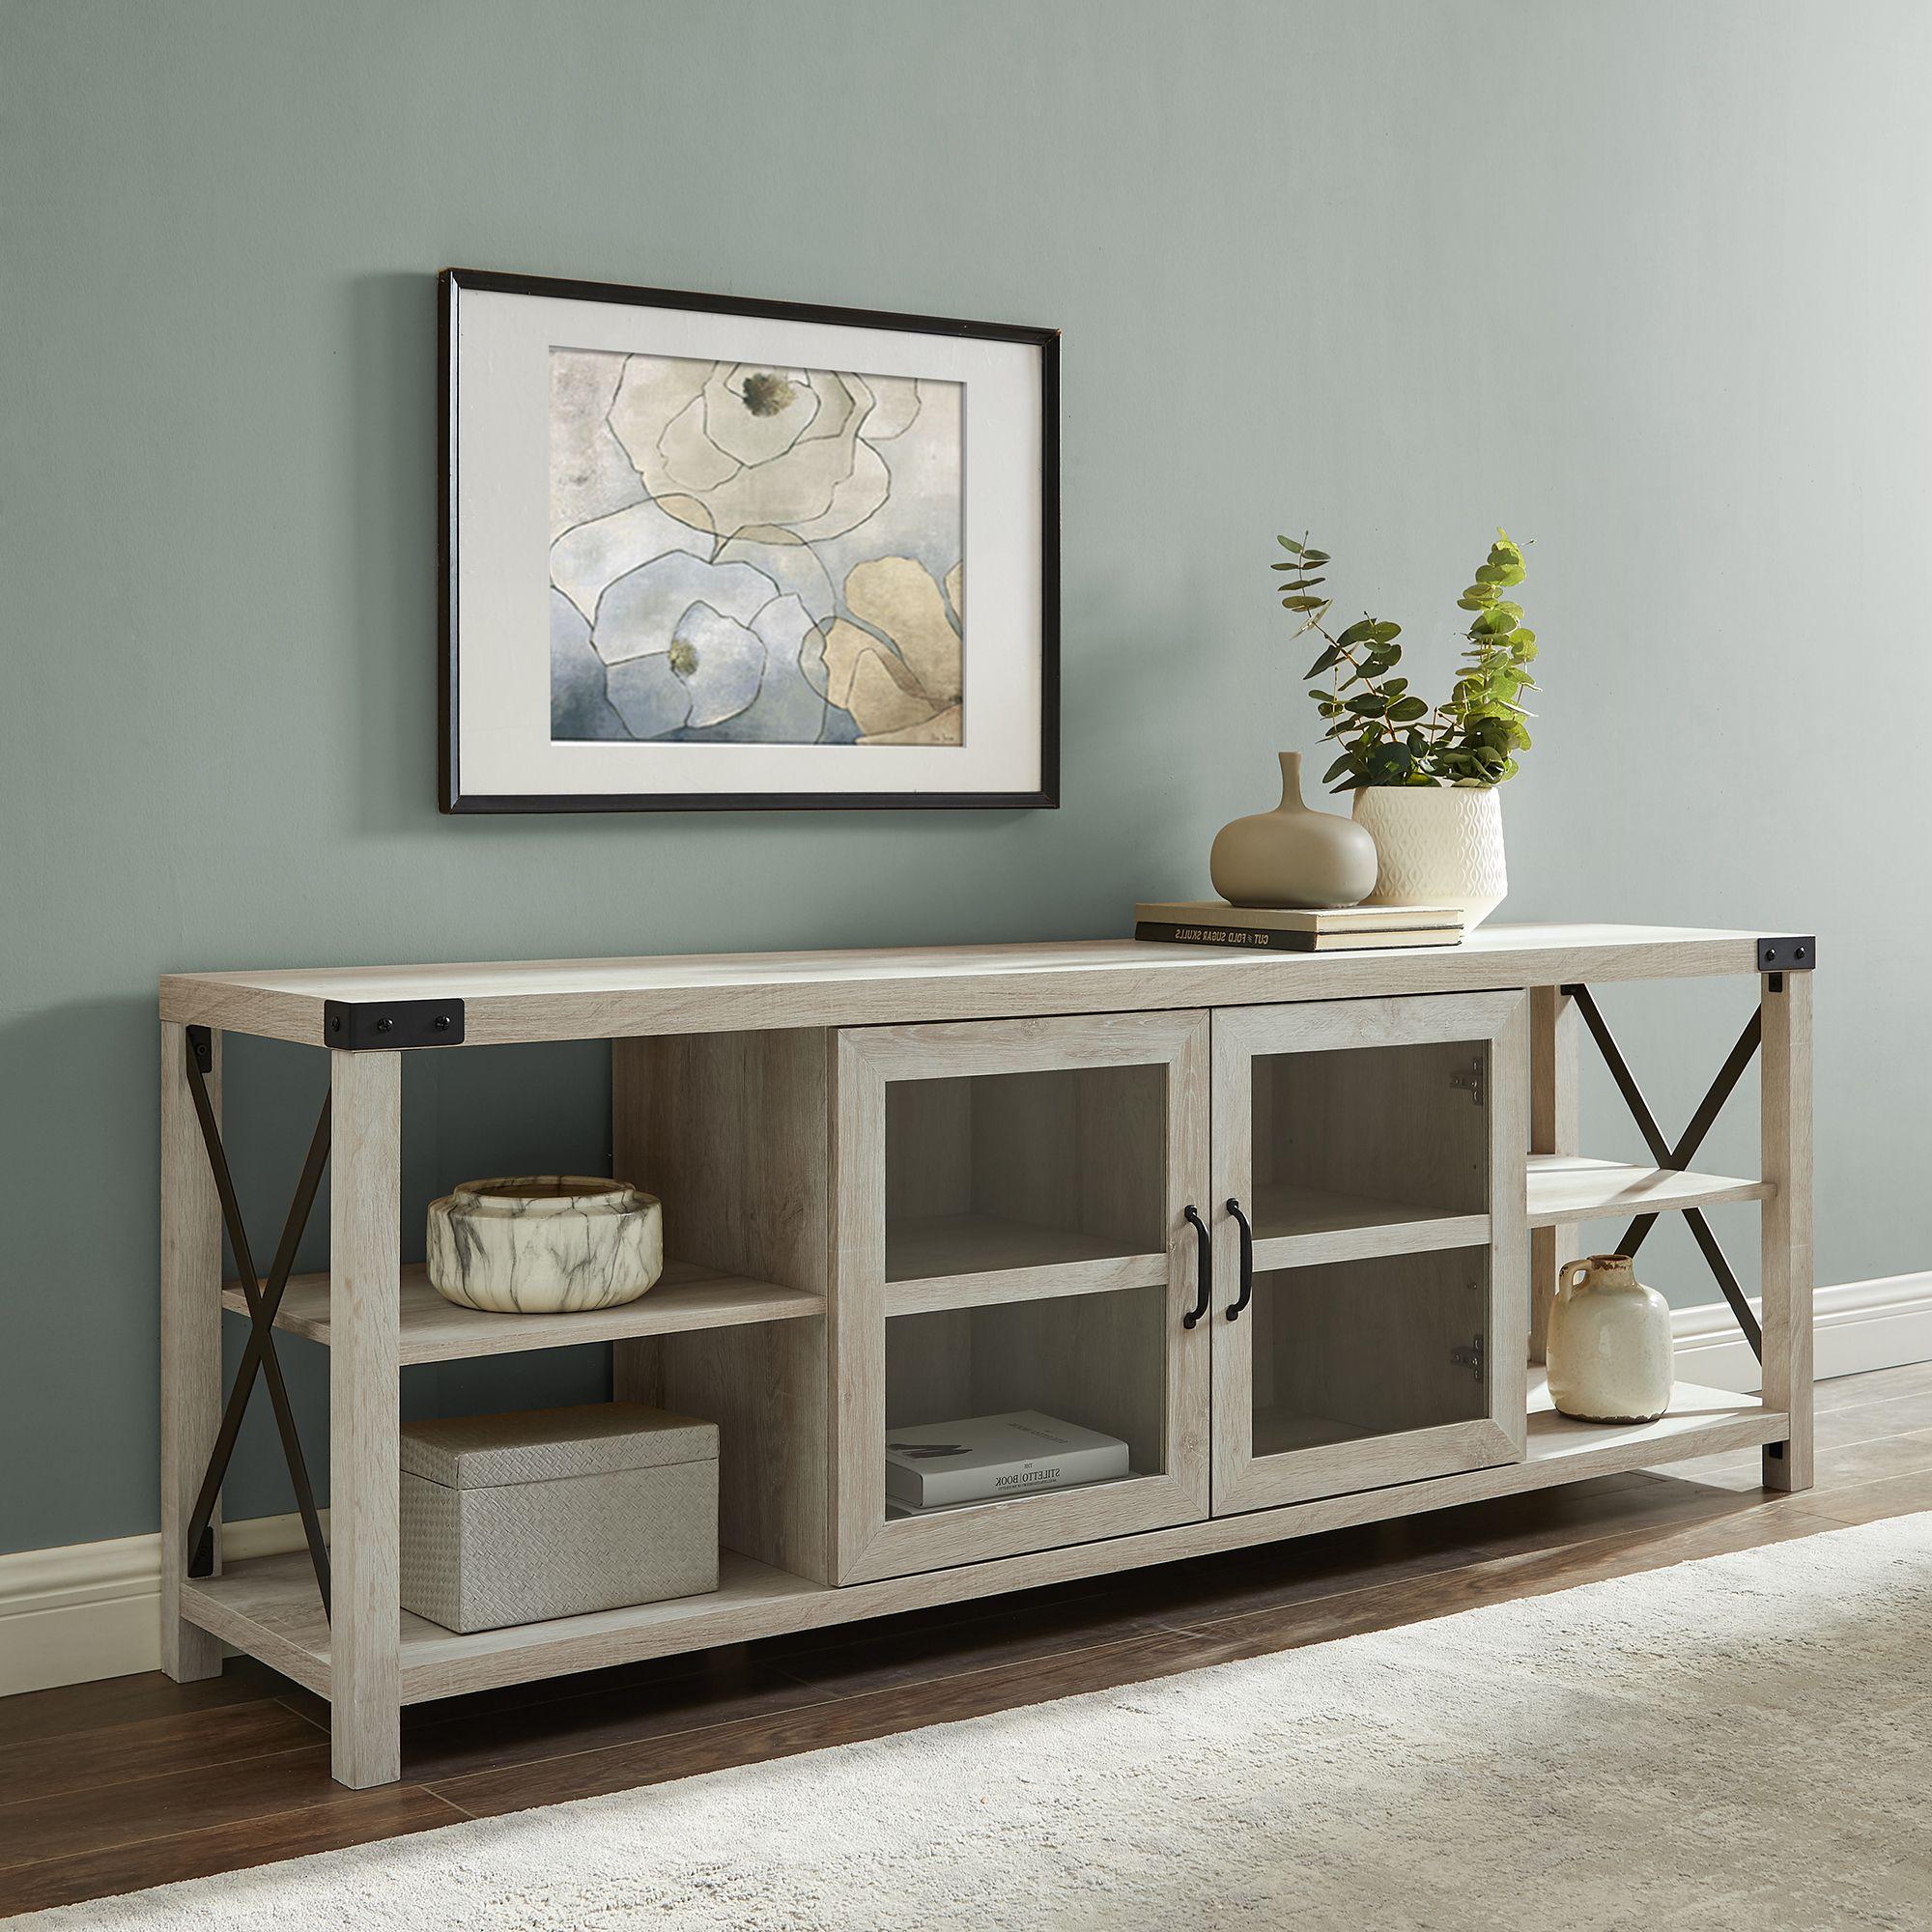 Free 2day shipping buy magnolia 70 2door white oak tv